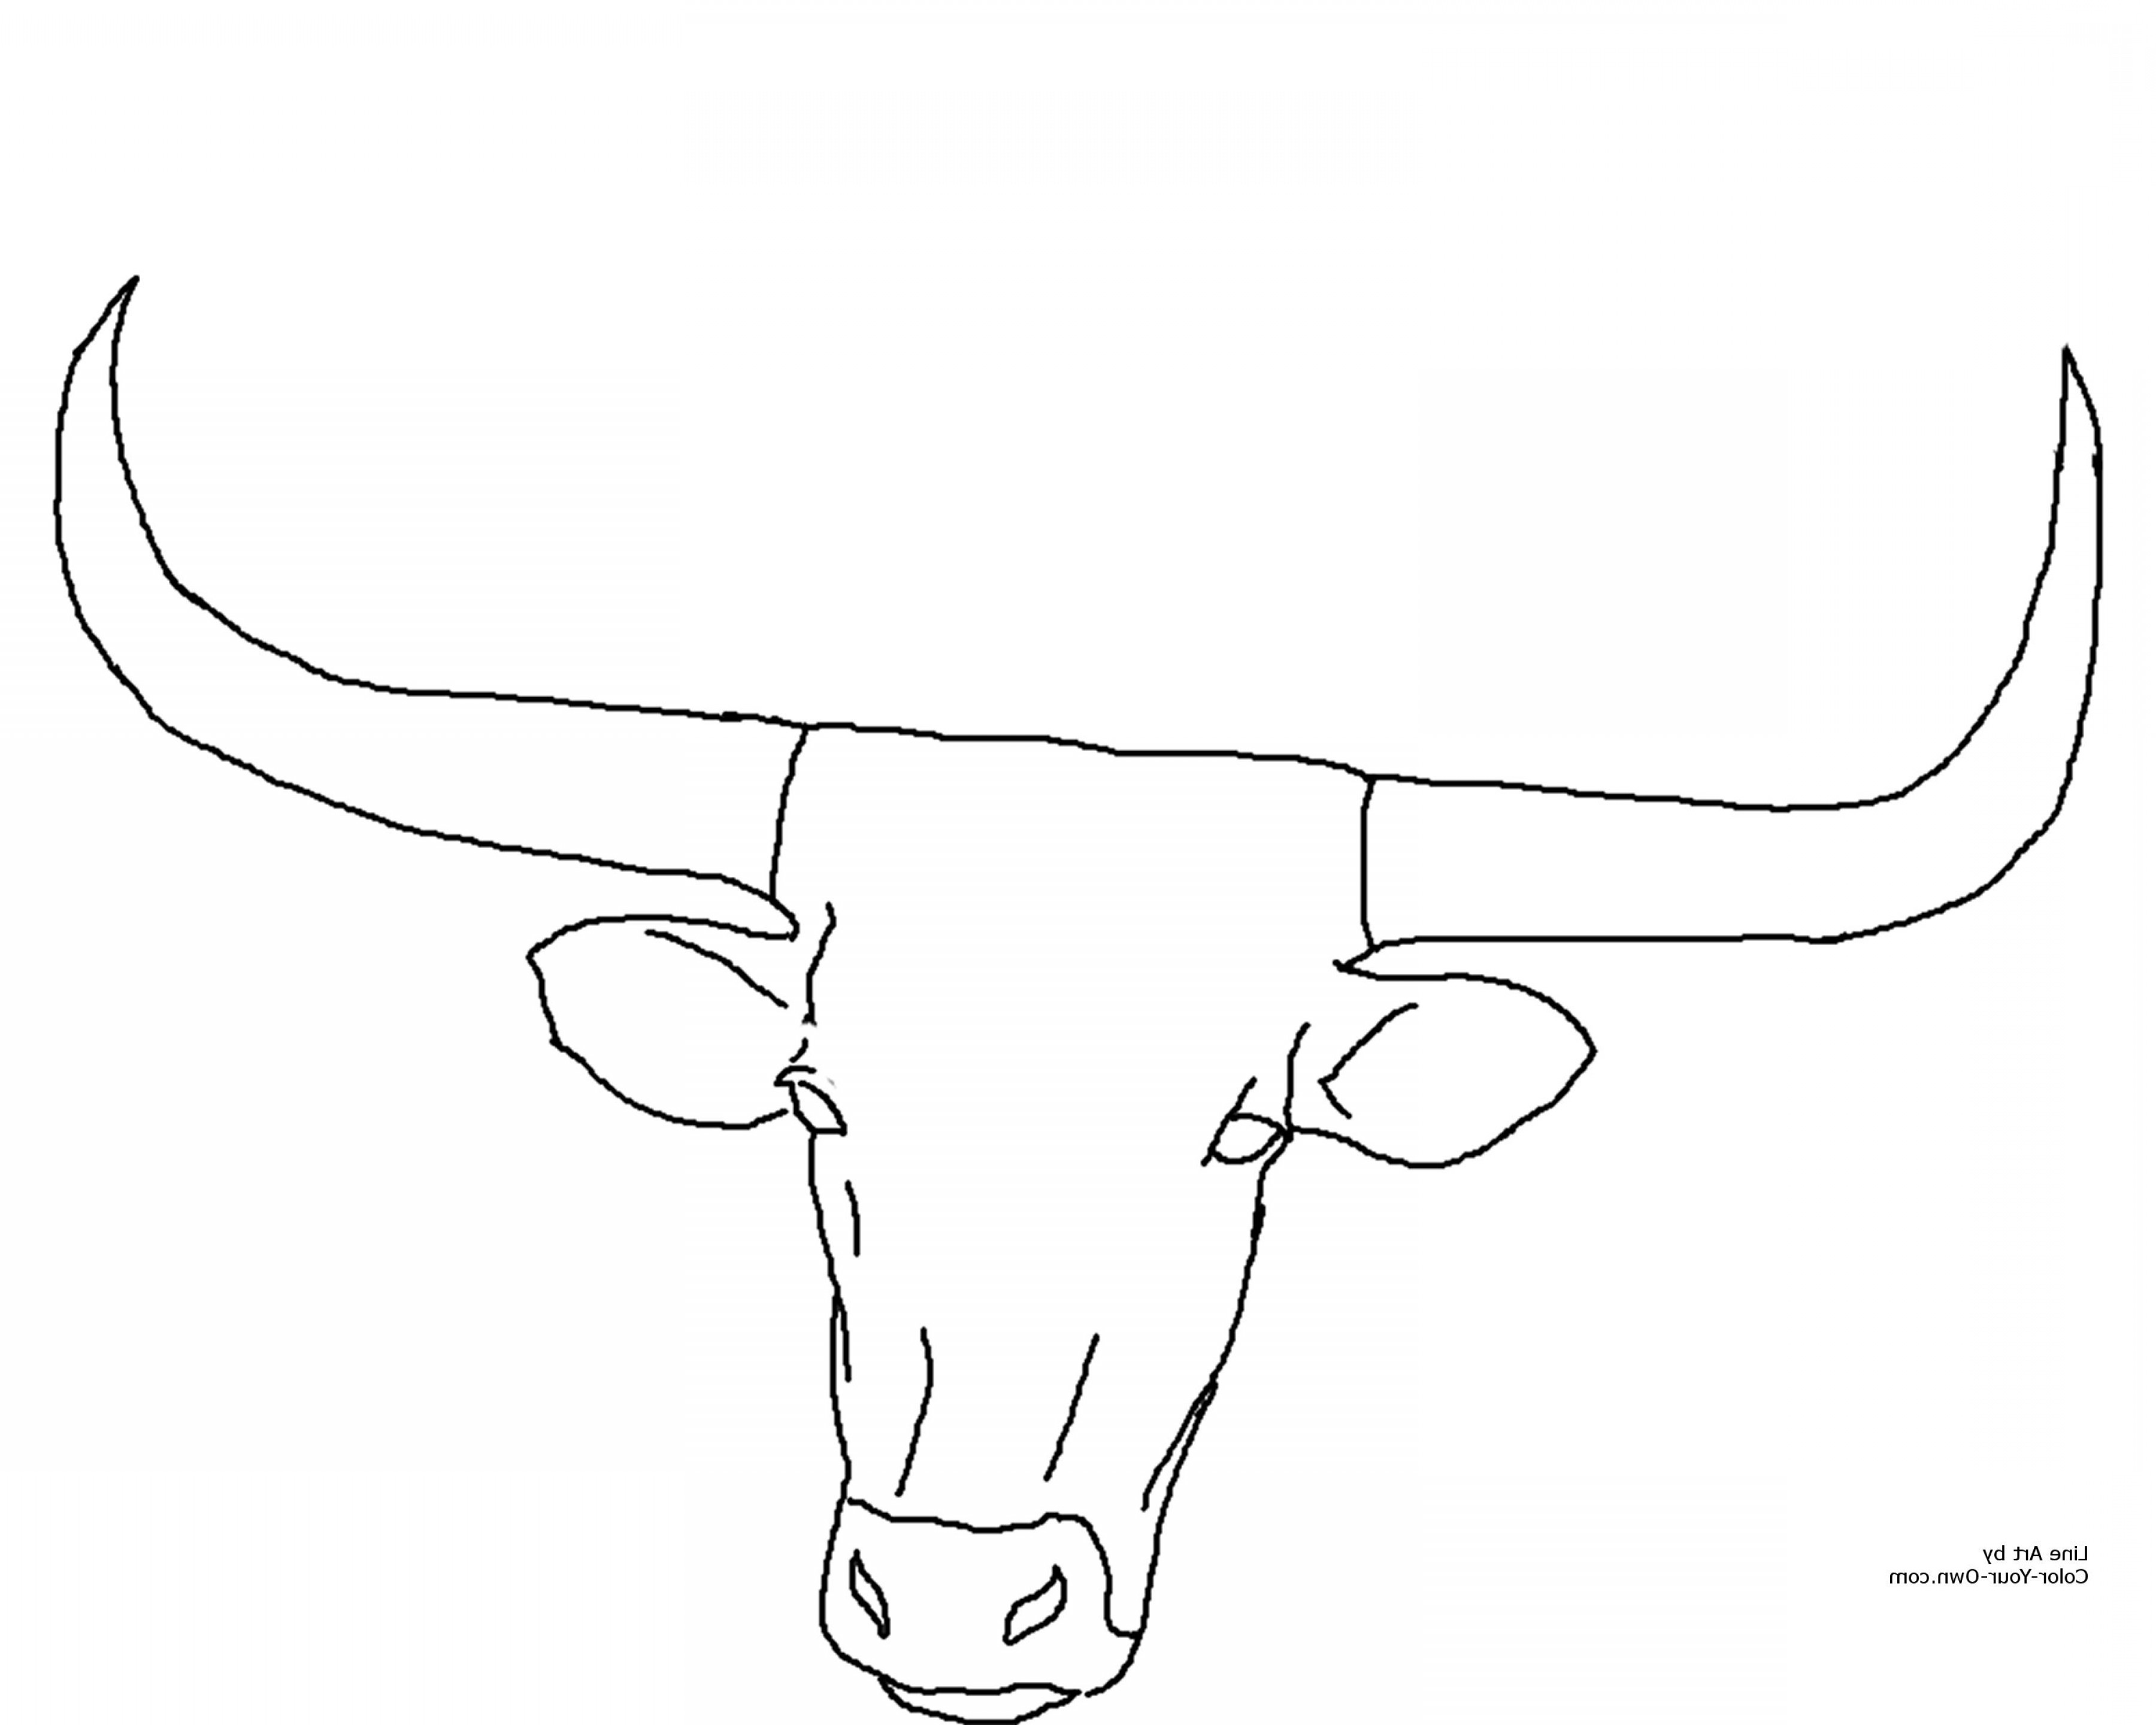 3600x2880 Mainstream Texas Tech Coloring Pages Vector Art Sohadacouri